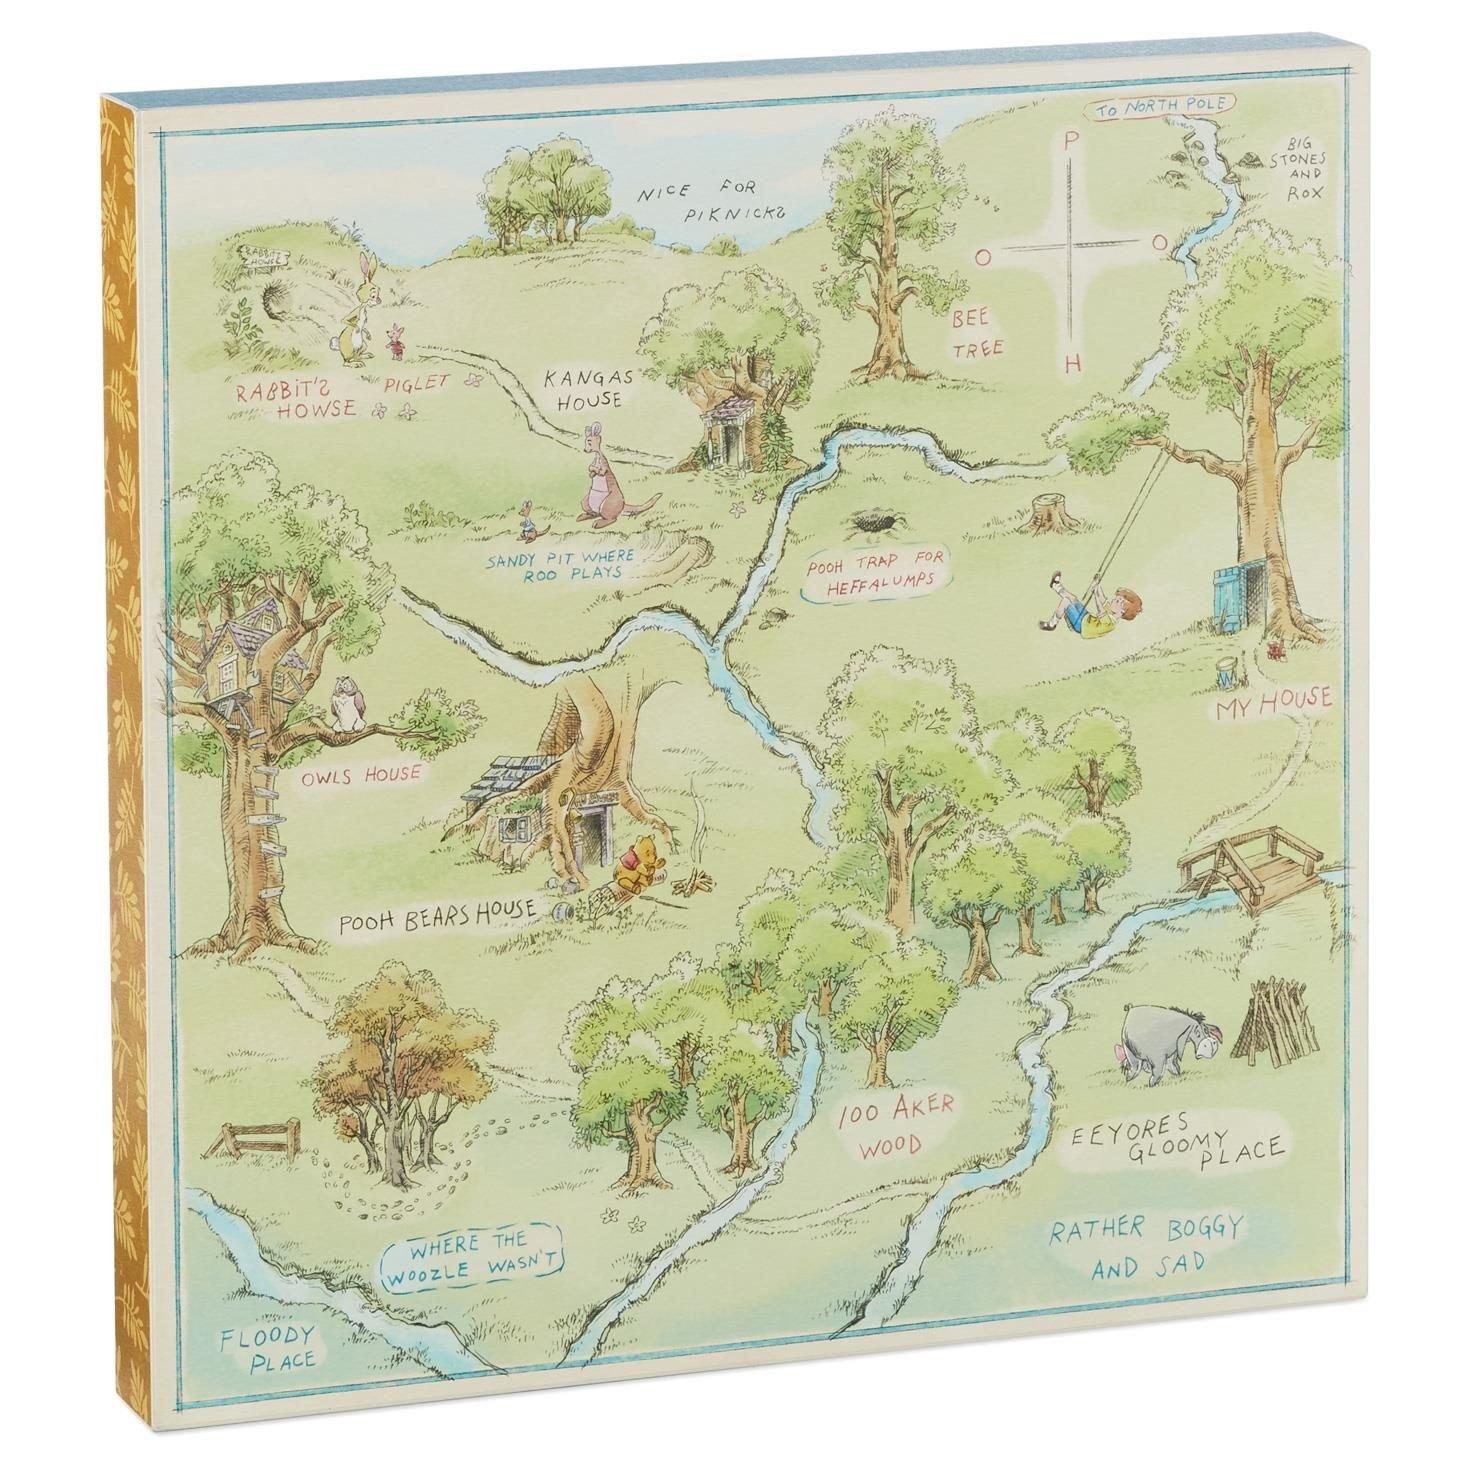 Amazon.com: Hallmark Hundred Acre Wood Map Art Birthday: Home & Kitchen